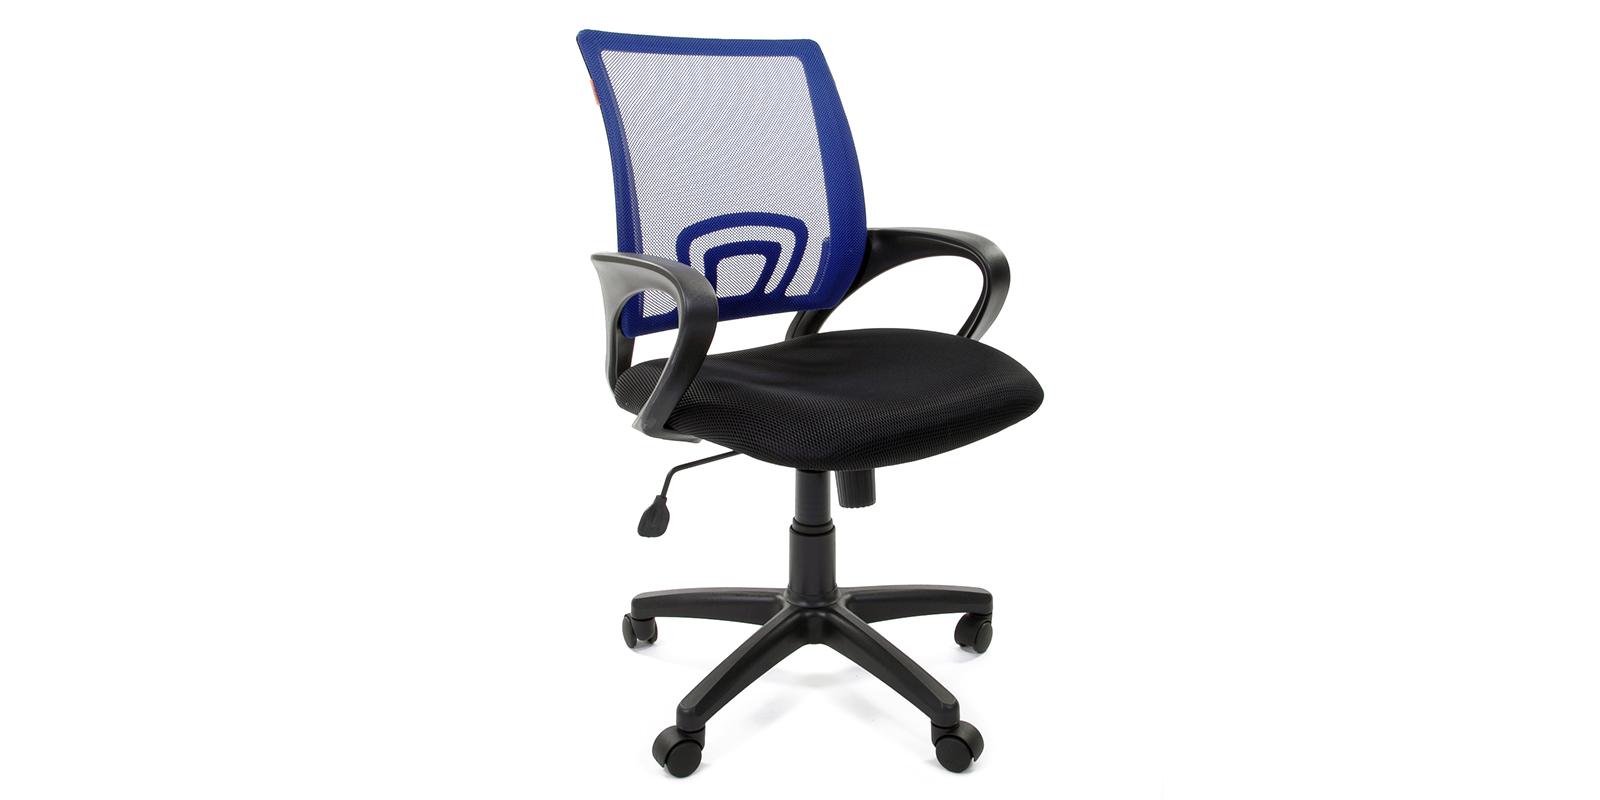 Игровое кресло HomeMe Chairman 696 от Homeme.ru